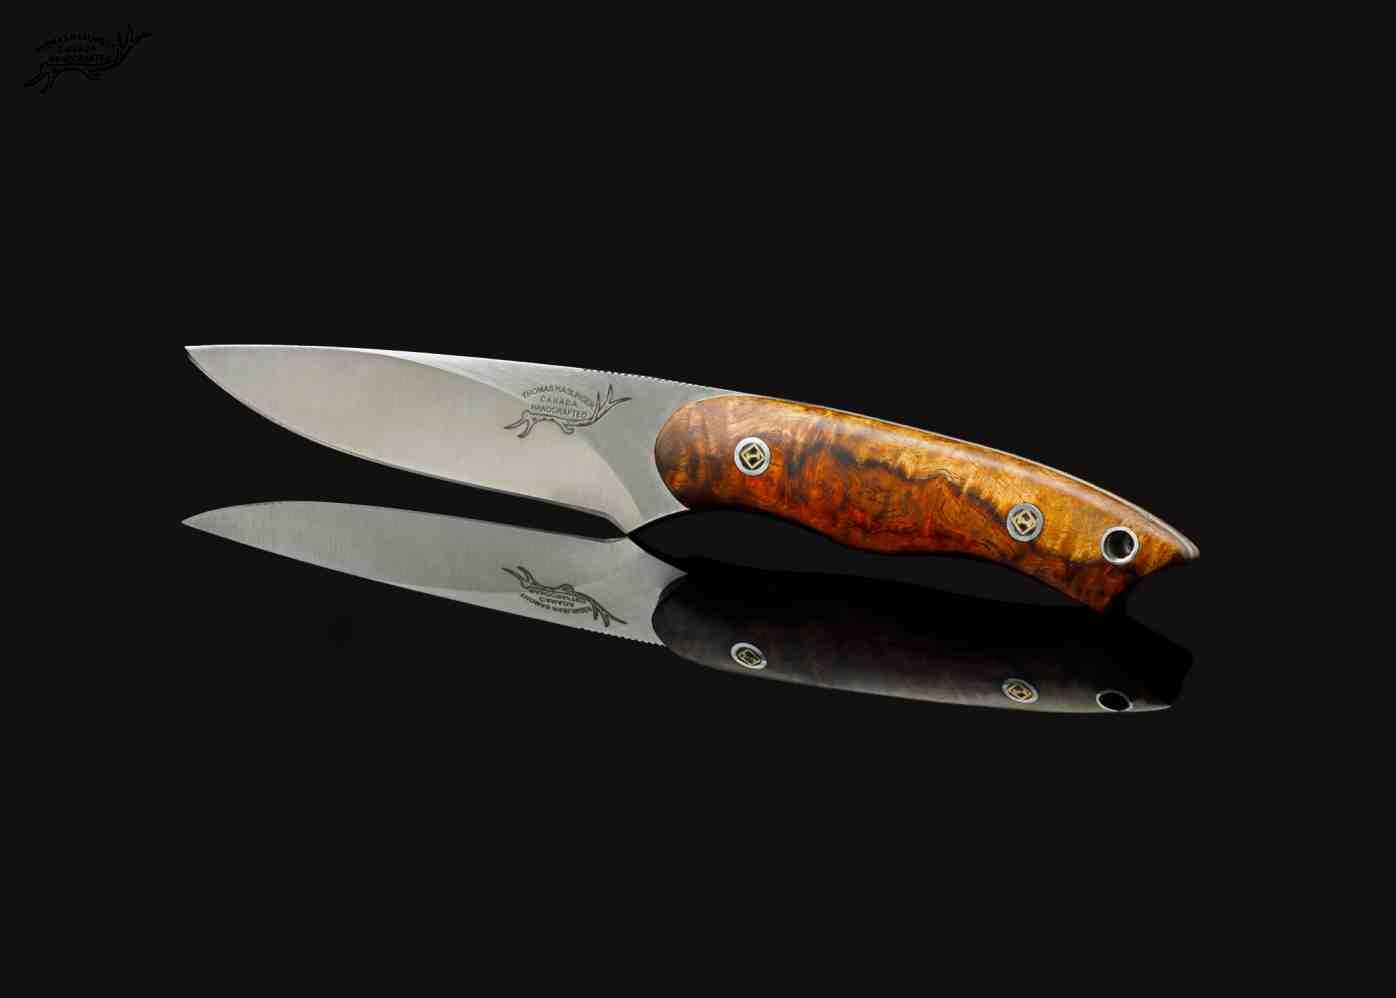 Two toned Thuya Burl Utility Knife side view